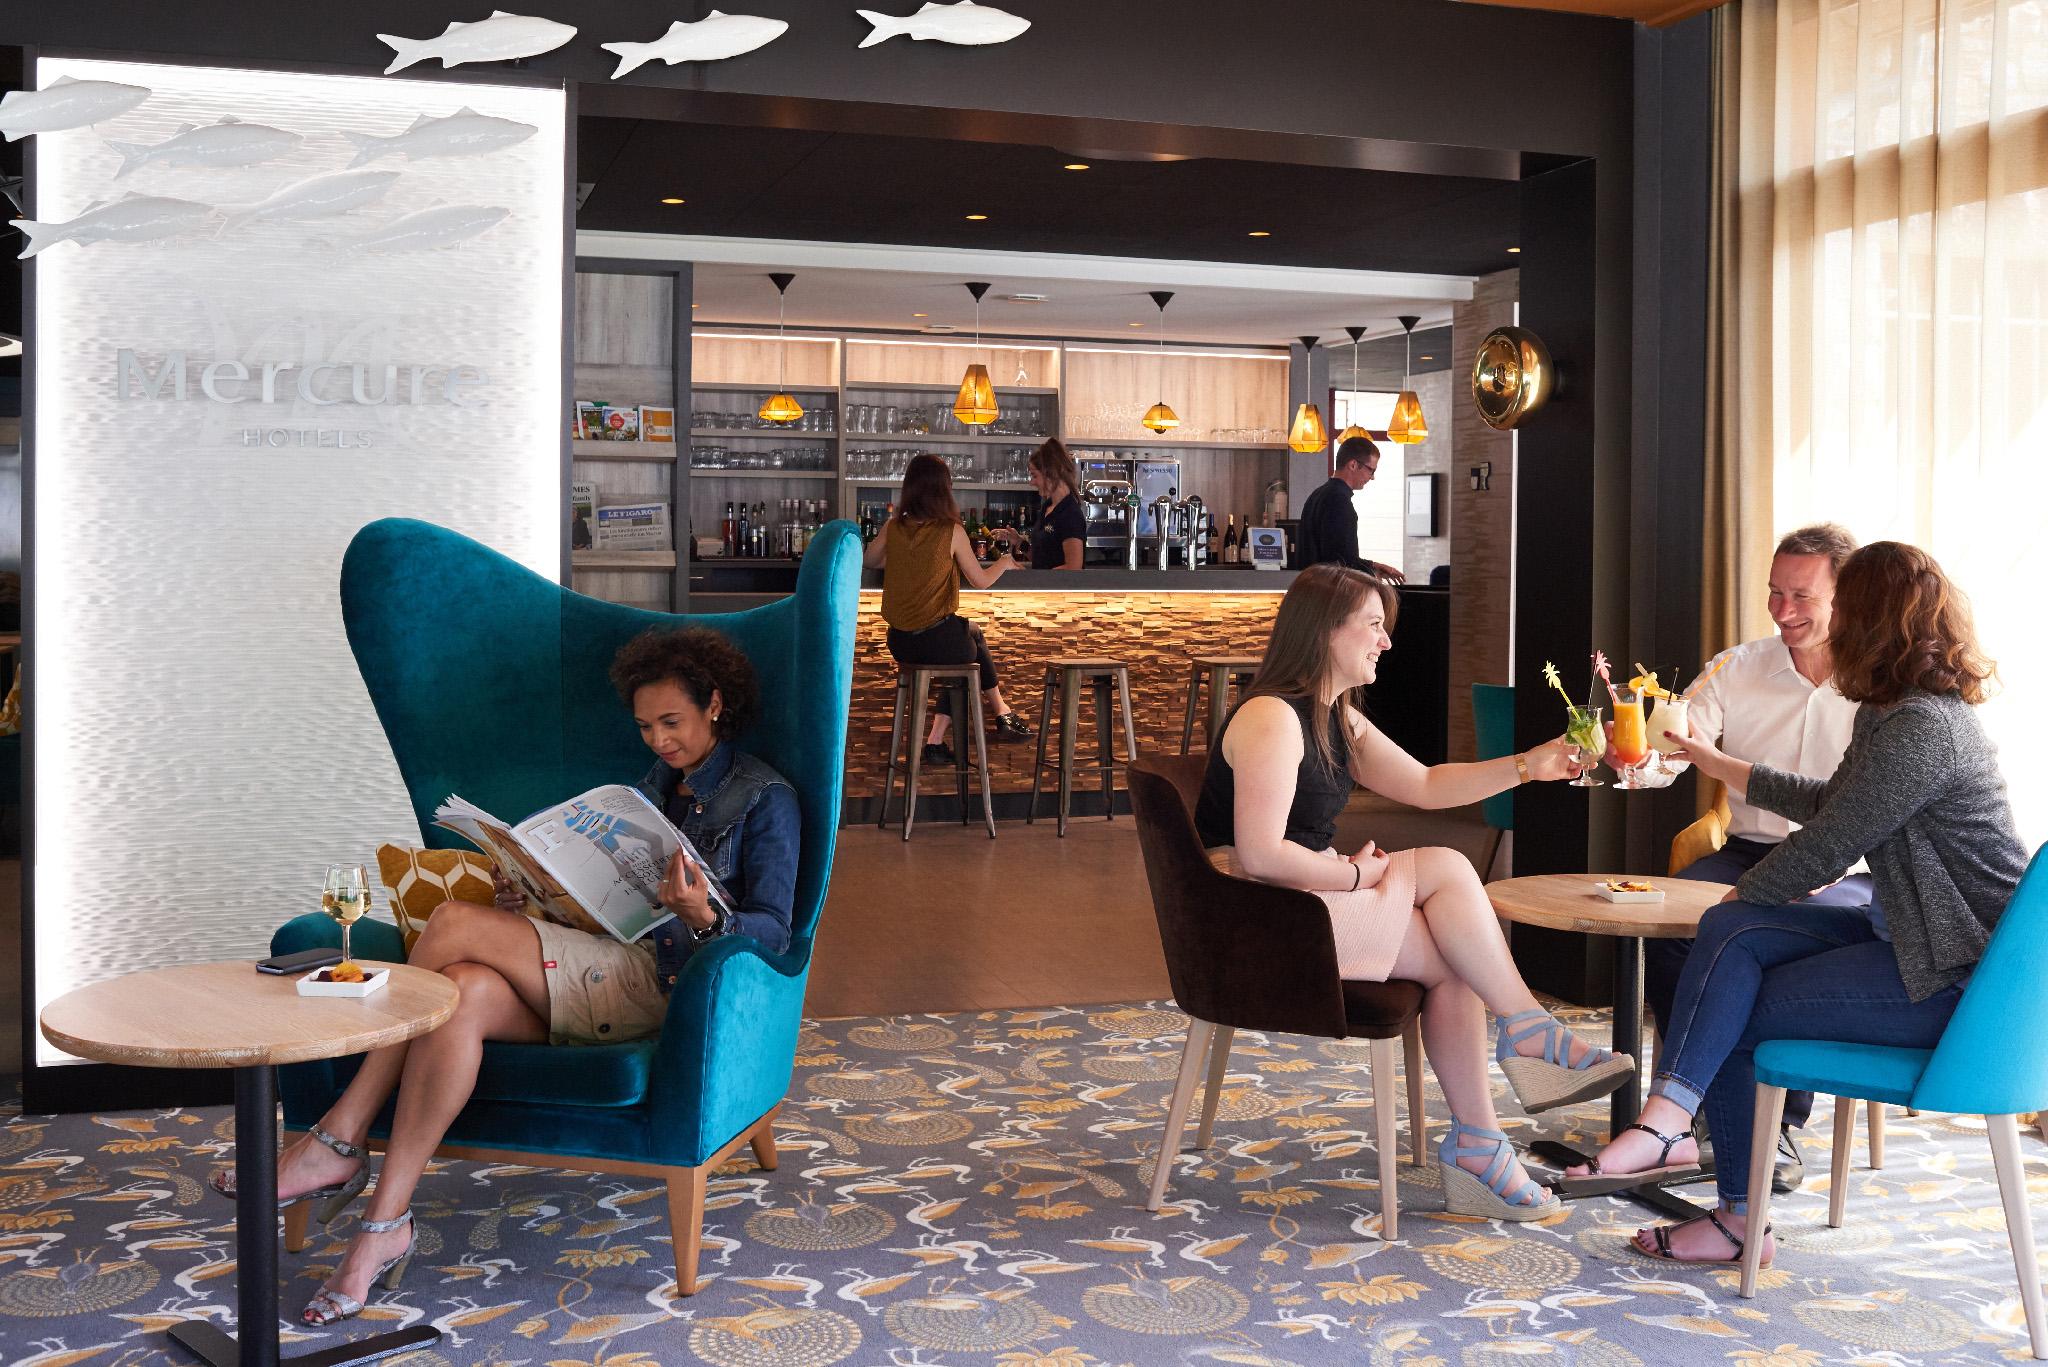 101_photographie_hotel_restaurant_nantes